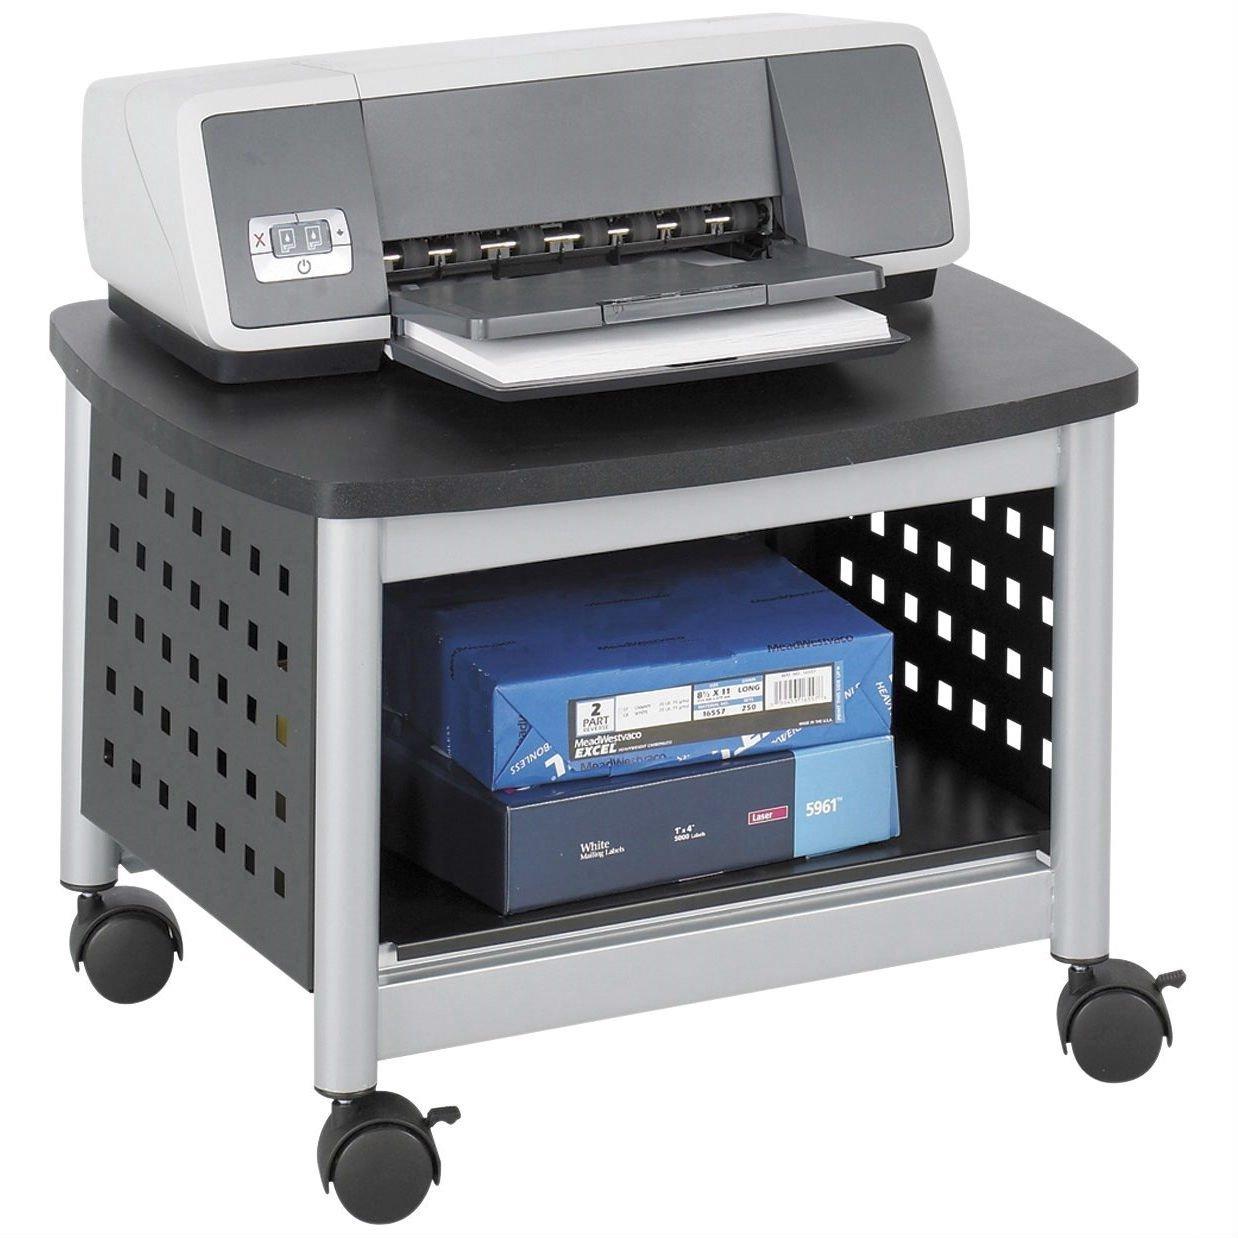 Under Desk Printer Stand Mobile Office Cart In Black And Silver In 2020 Printer Stand Safco Mobile Office